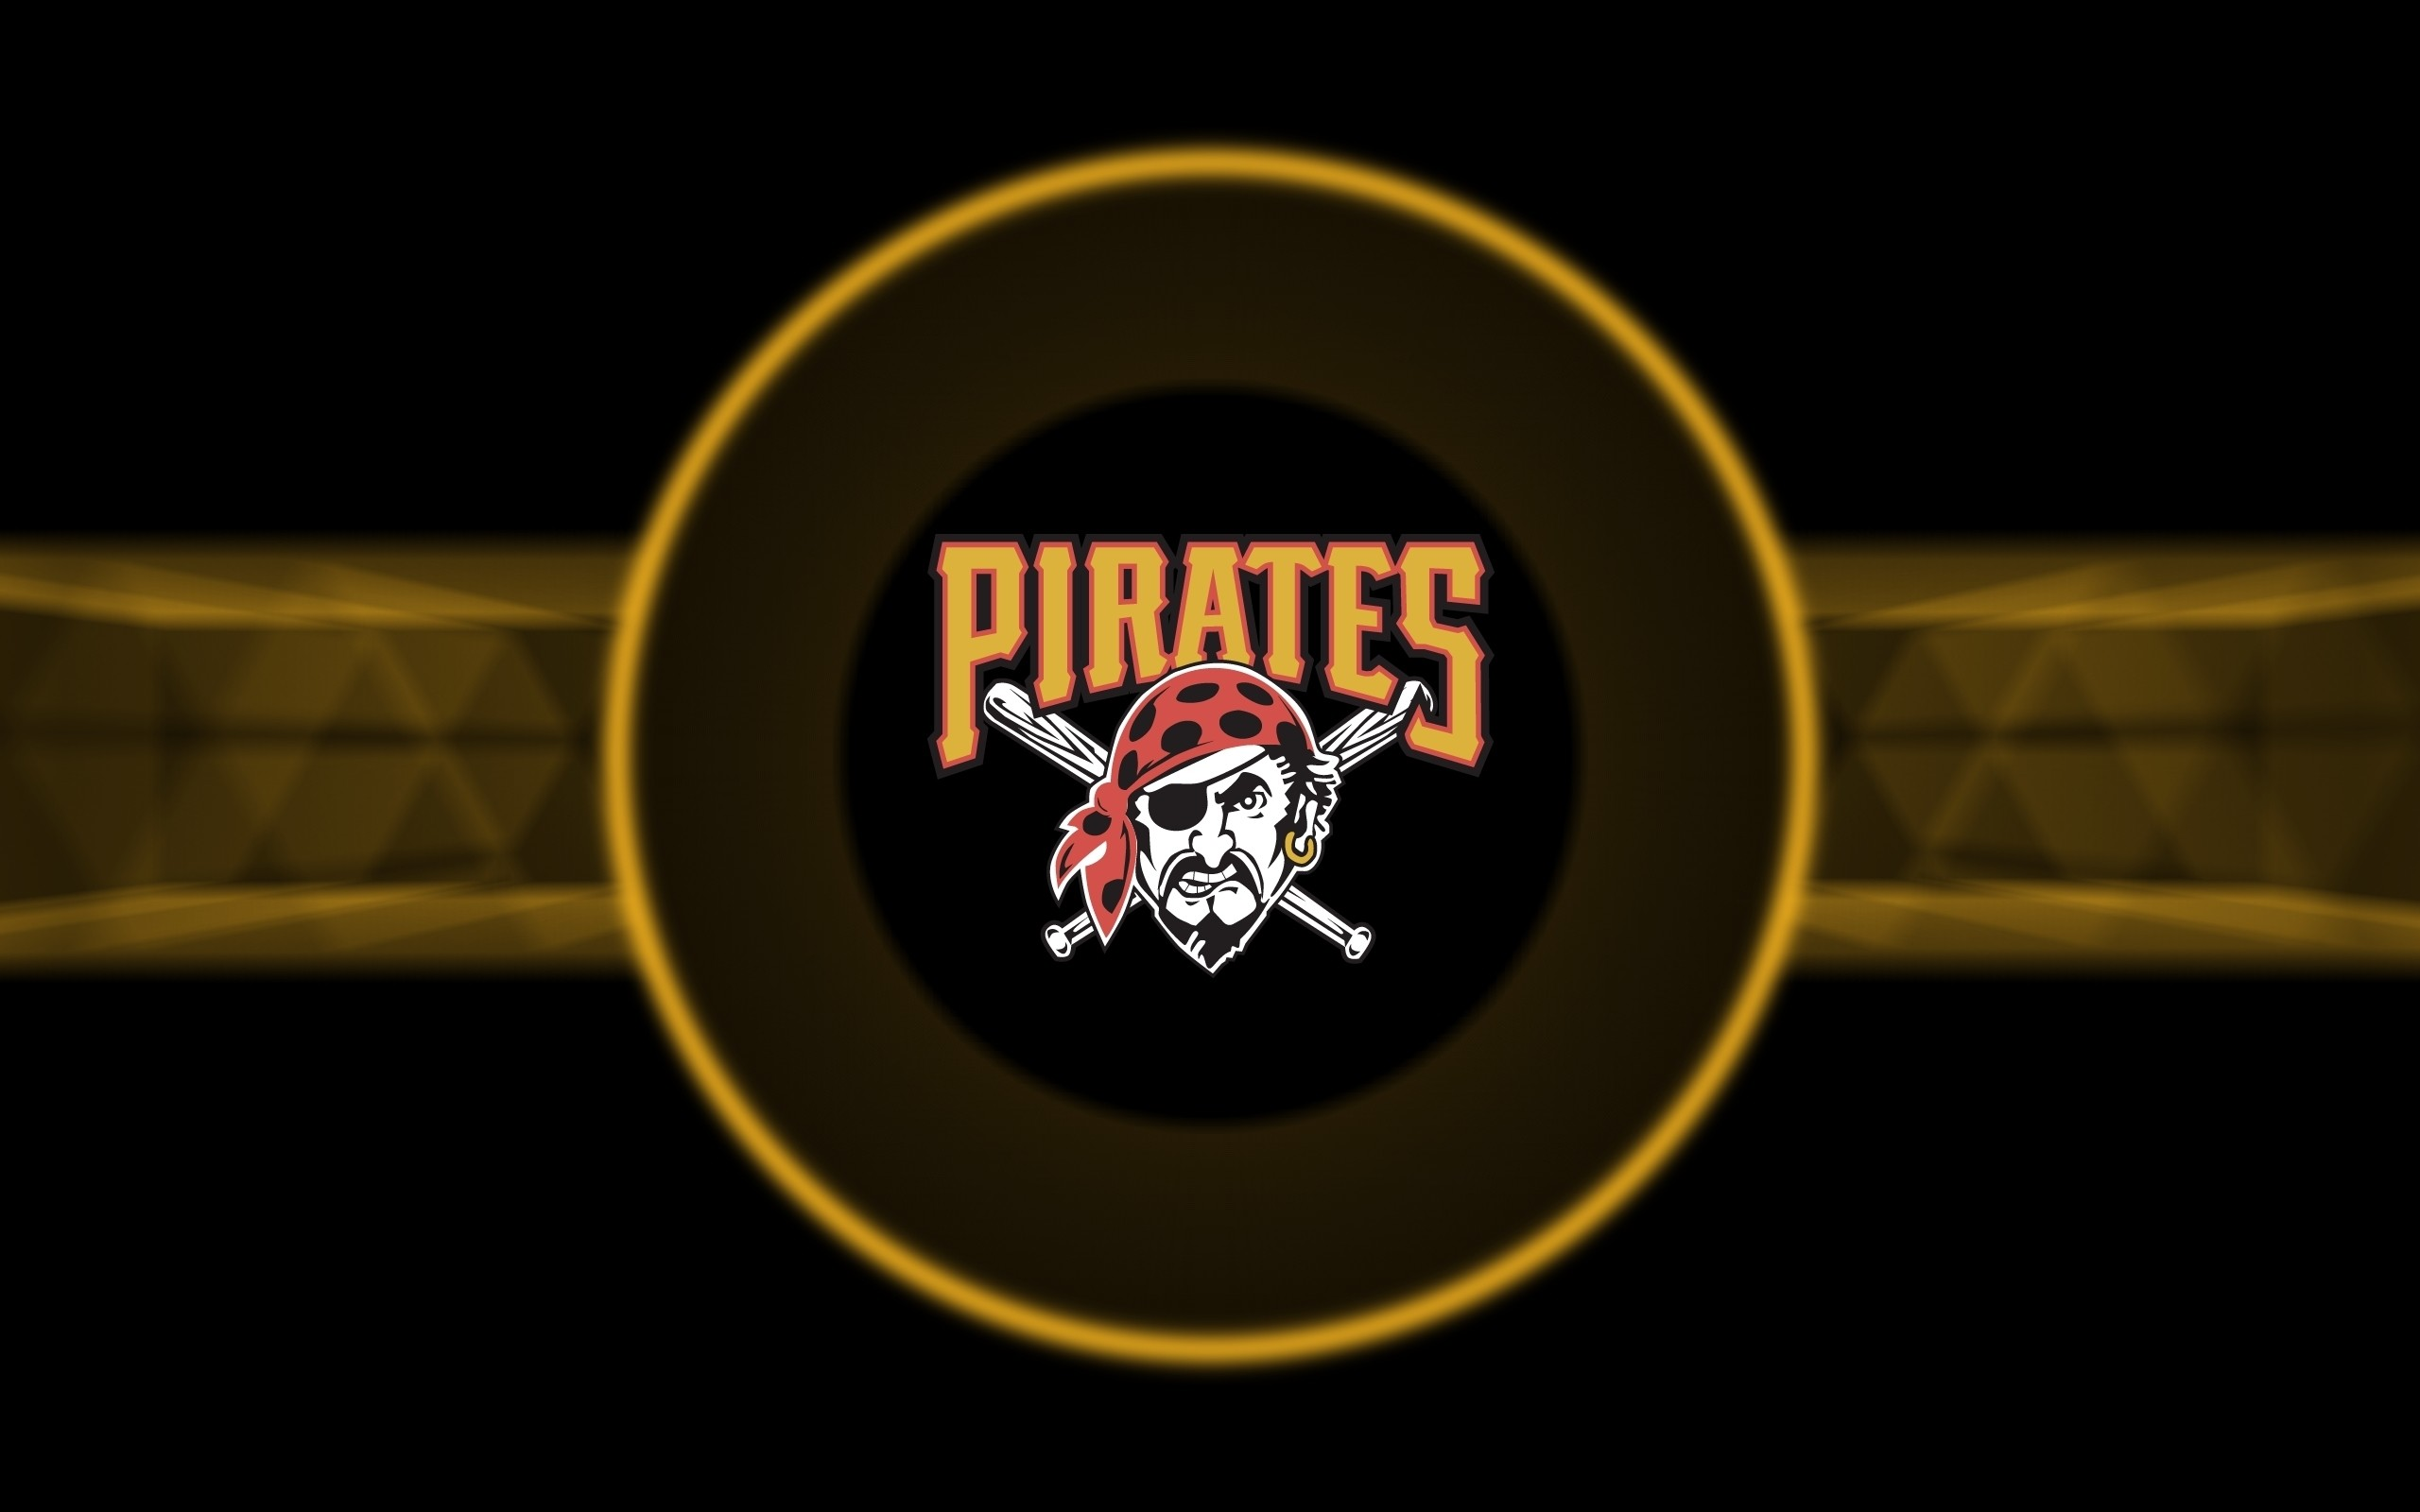 pirates-baseball-mlb-pittsburgh-pittsburgh-pirates-wide.jpg